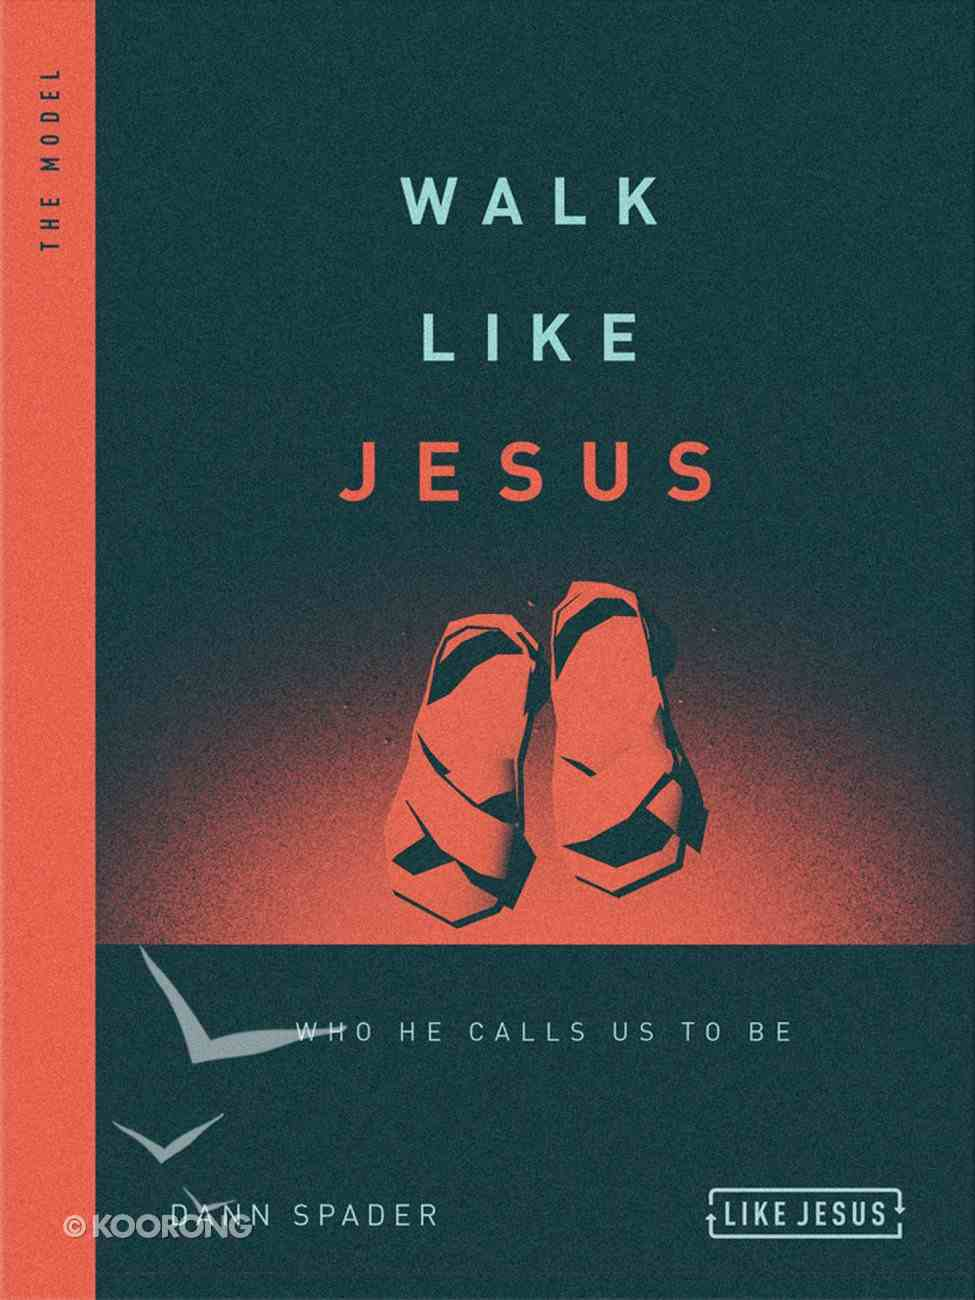 Walk Like Jesus: Who He Calls Us to Be: The Model (Like Jesus Series) eBook